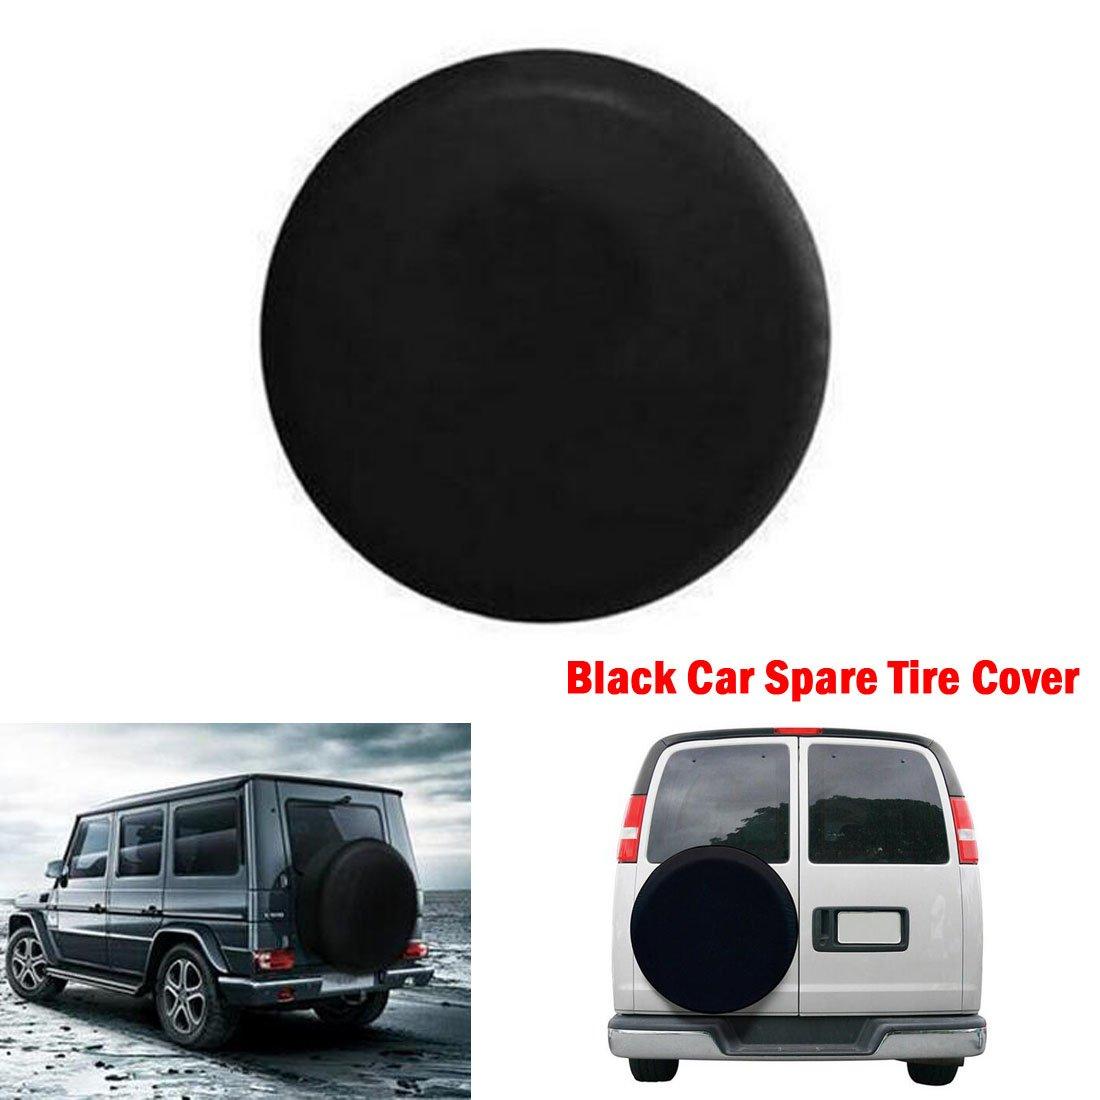 Reserveradabdeckung Pneus De Carro Reserveradabdeckung Schwarz PU-Anh/änger Leder Car Styling schwarz 15 1x